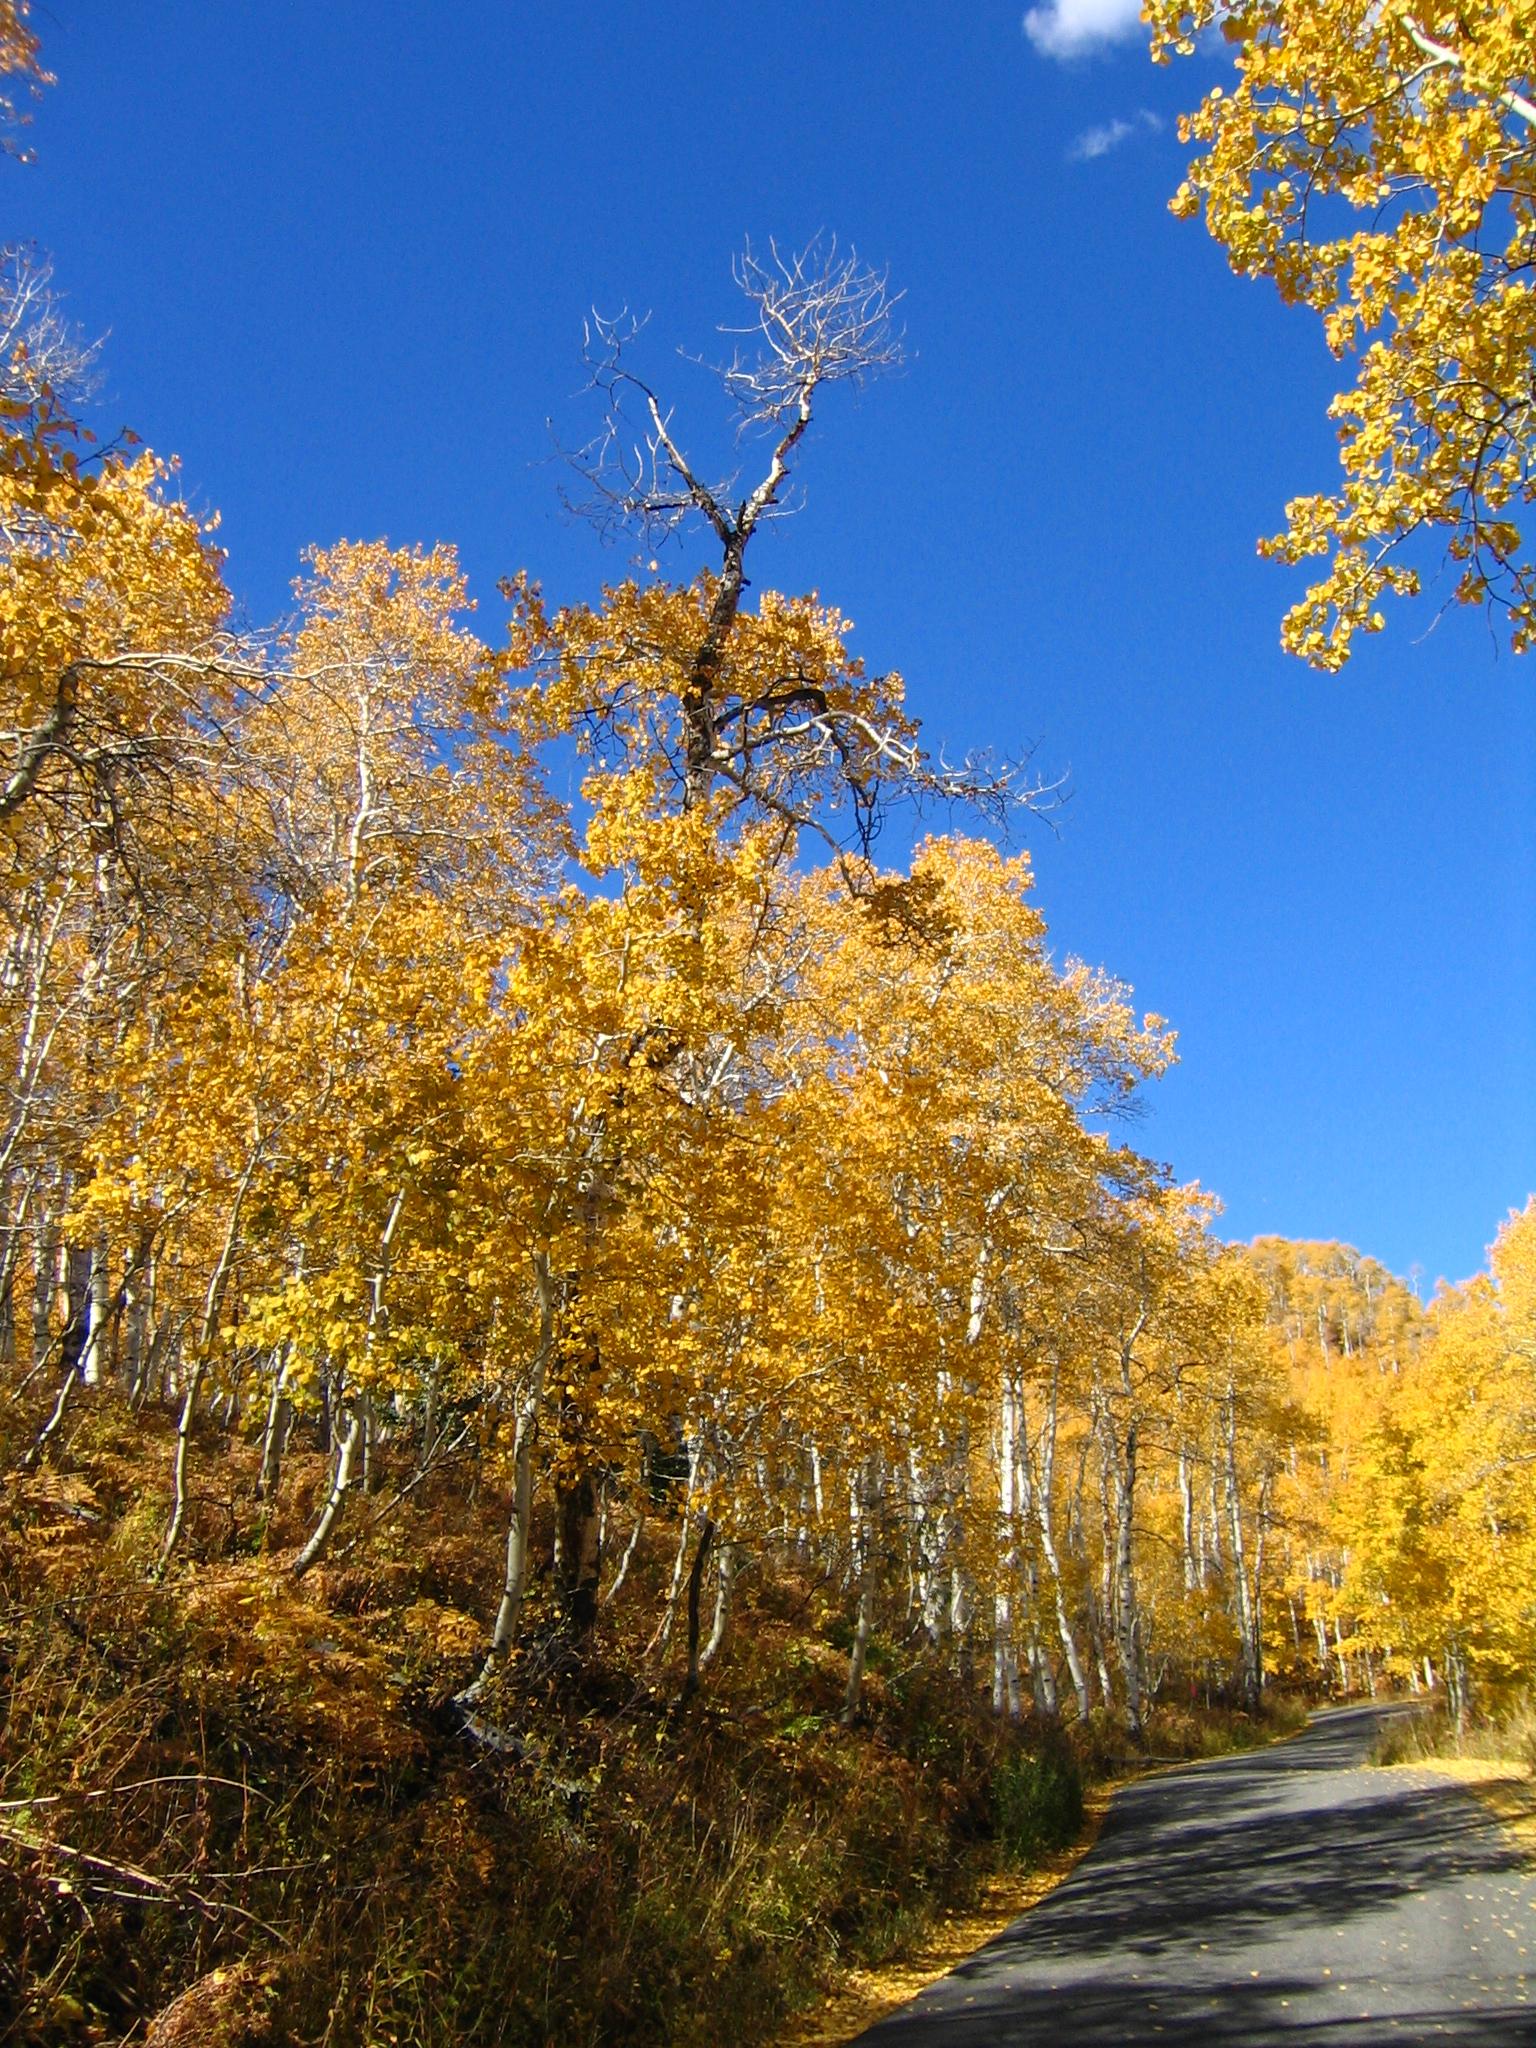 [Image: October_12_2005_Alpine_Loop_Utah_United_States.JPG]